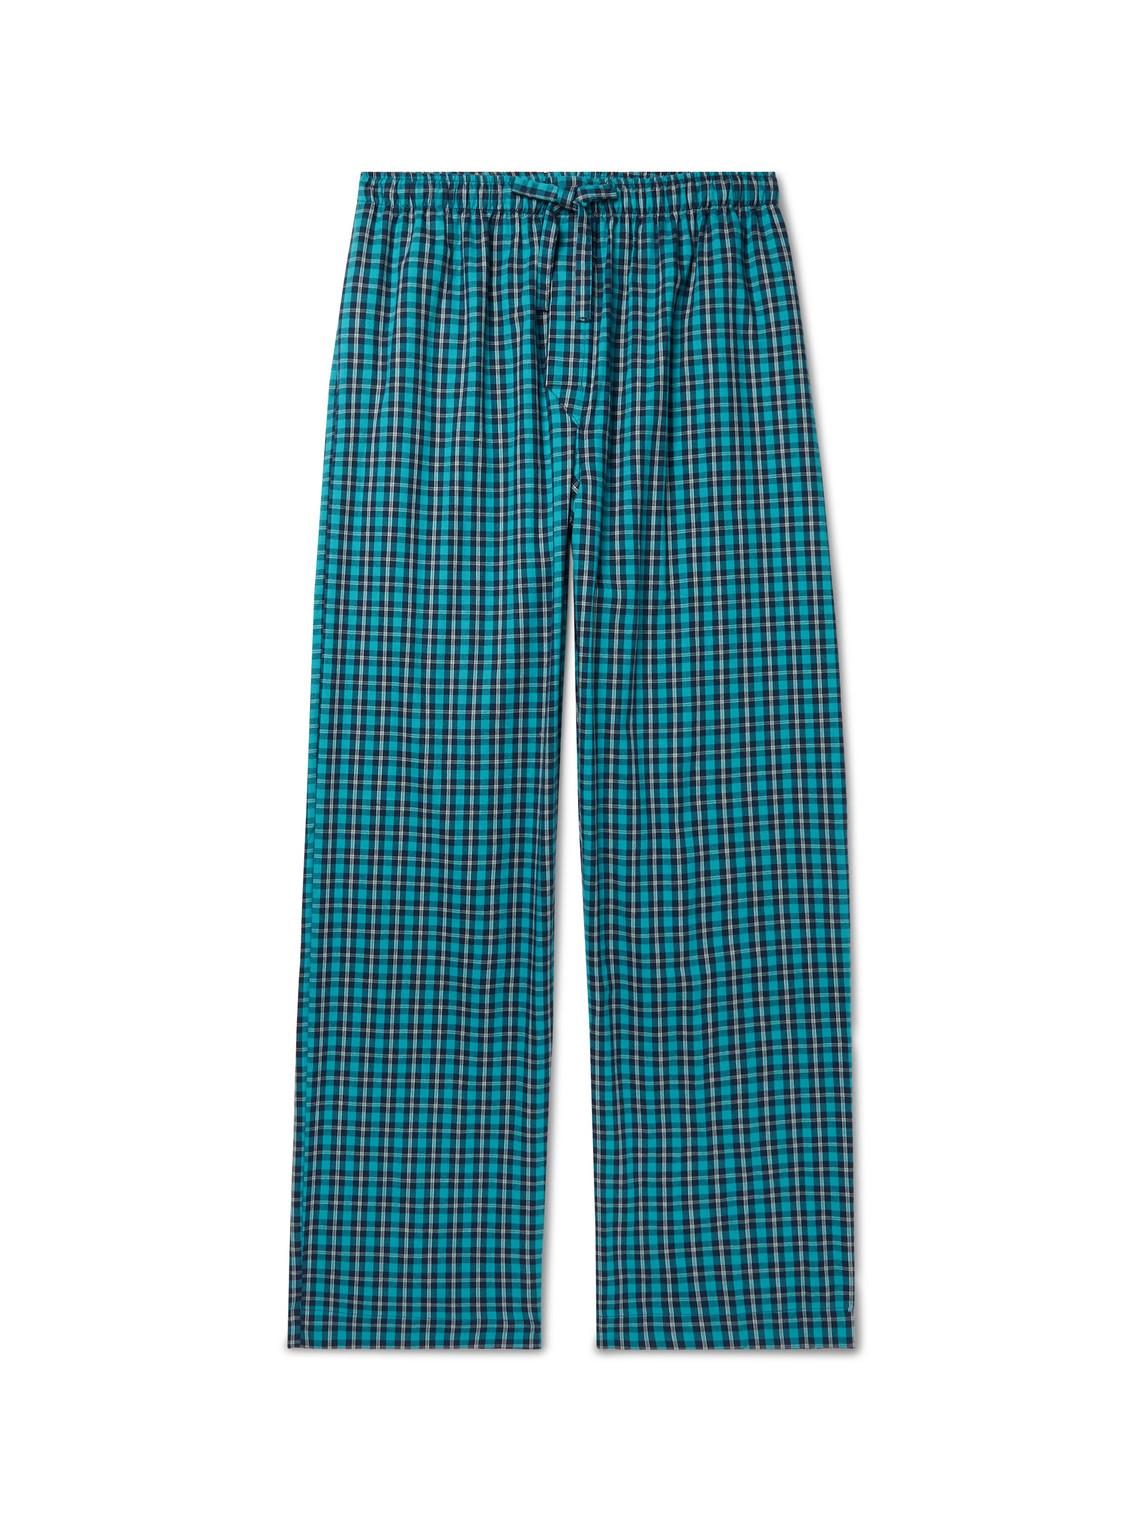 derek rose - checked brushed cotton-twill pyjama trousers - men - multi - xxl